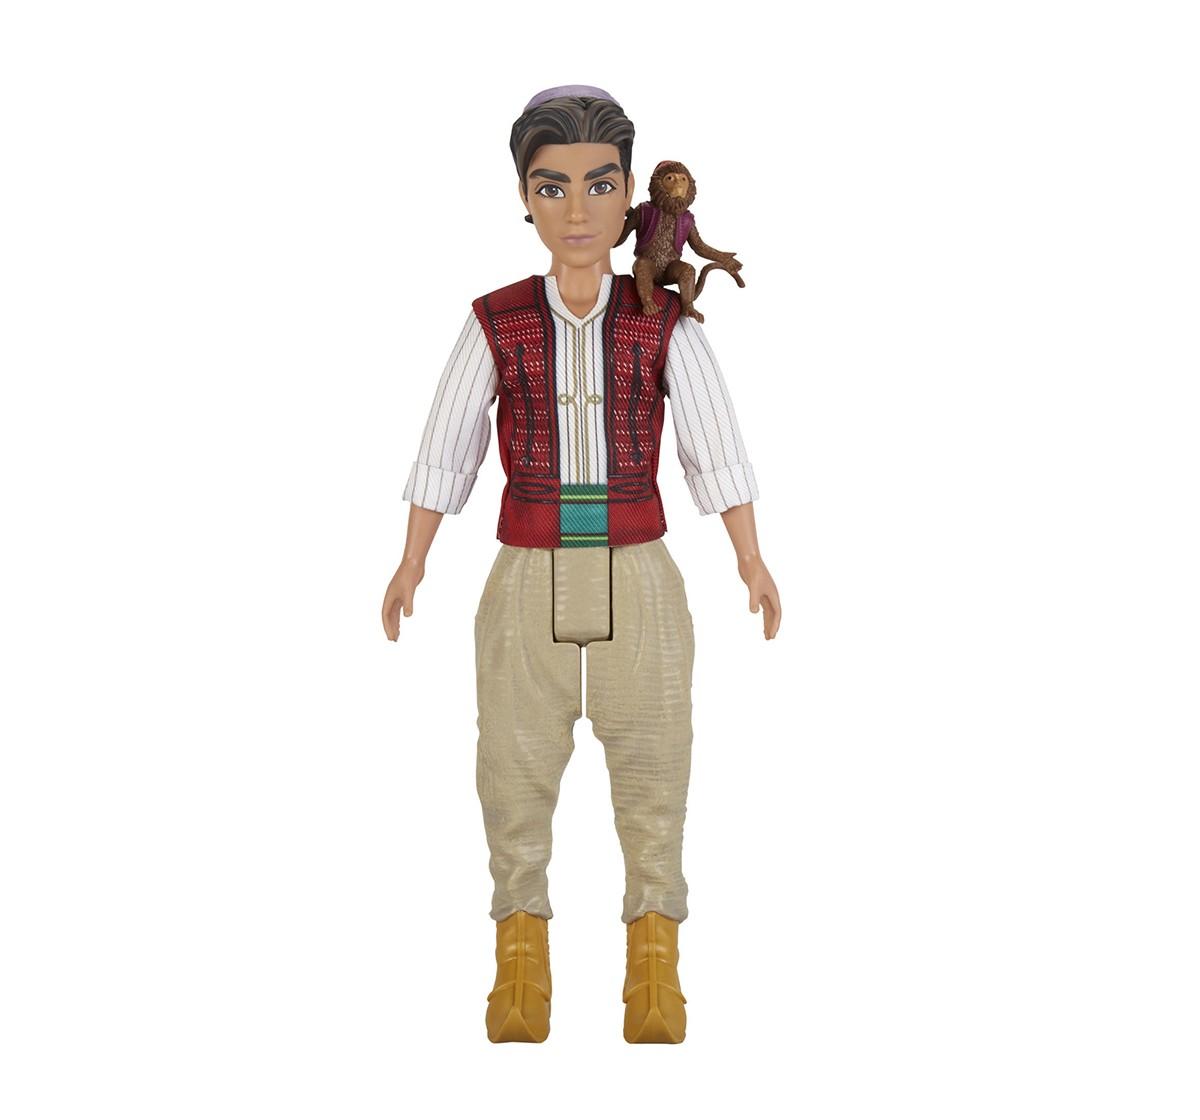 Disney Aladdin Doll Assorted Dolls & Accessories for Kids age 3Y+